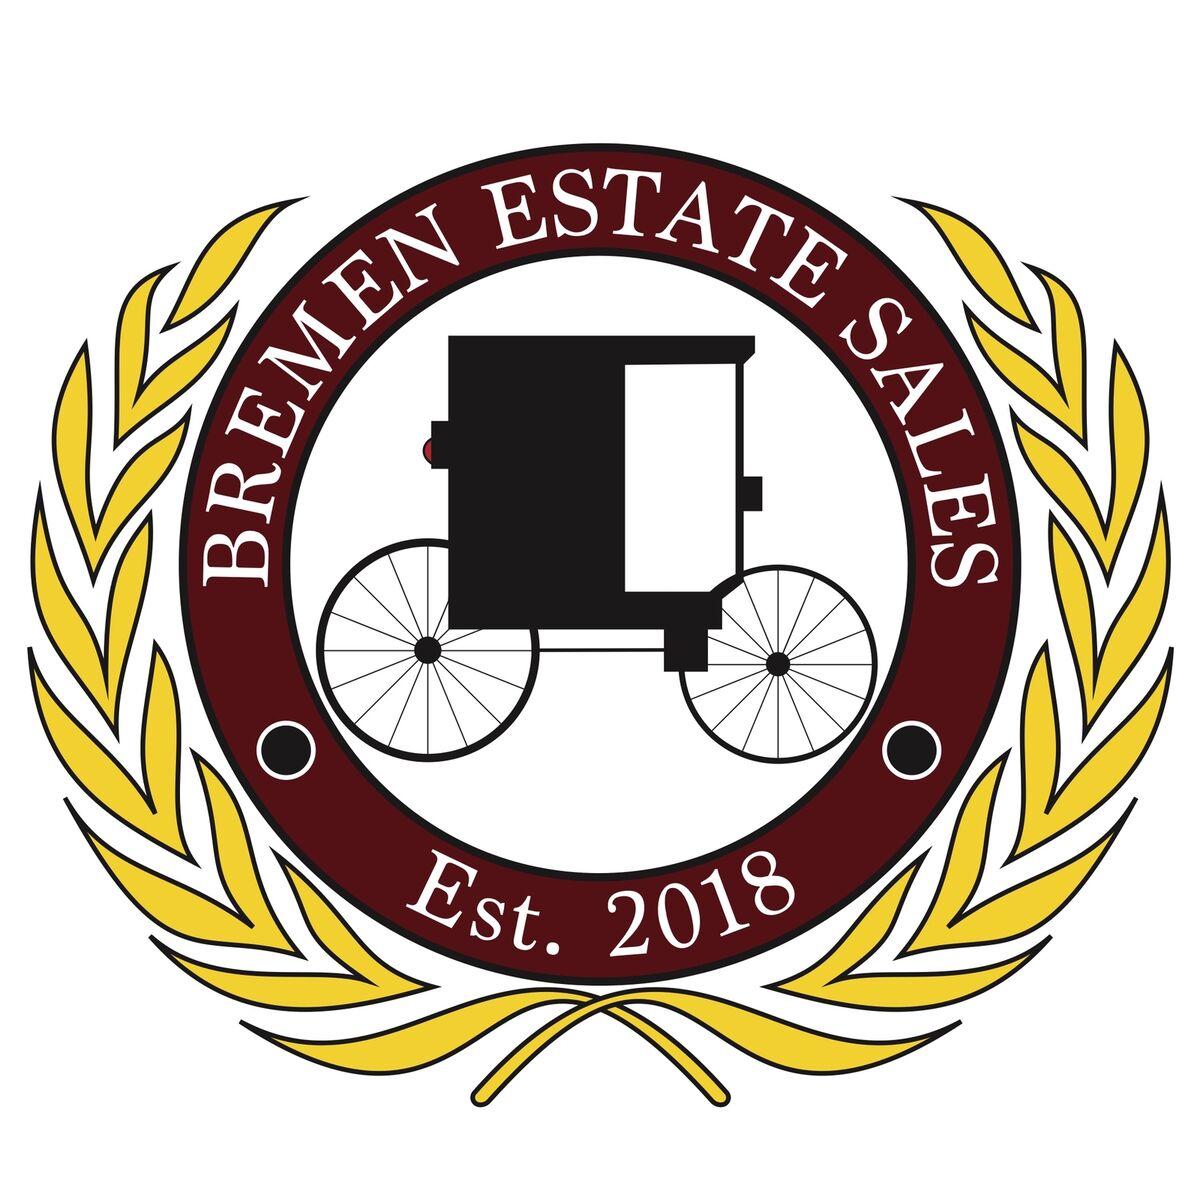 Bremen Esate Sales